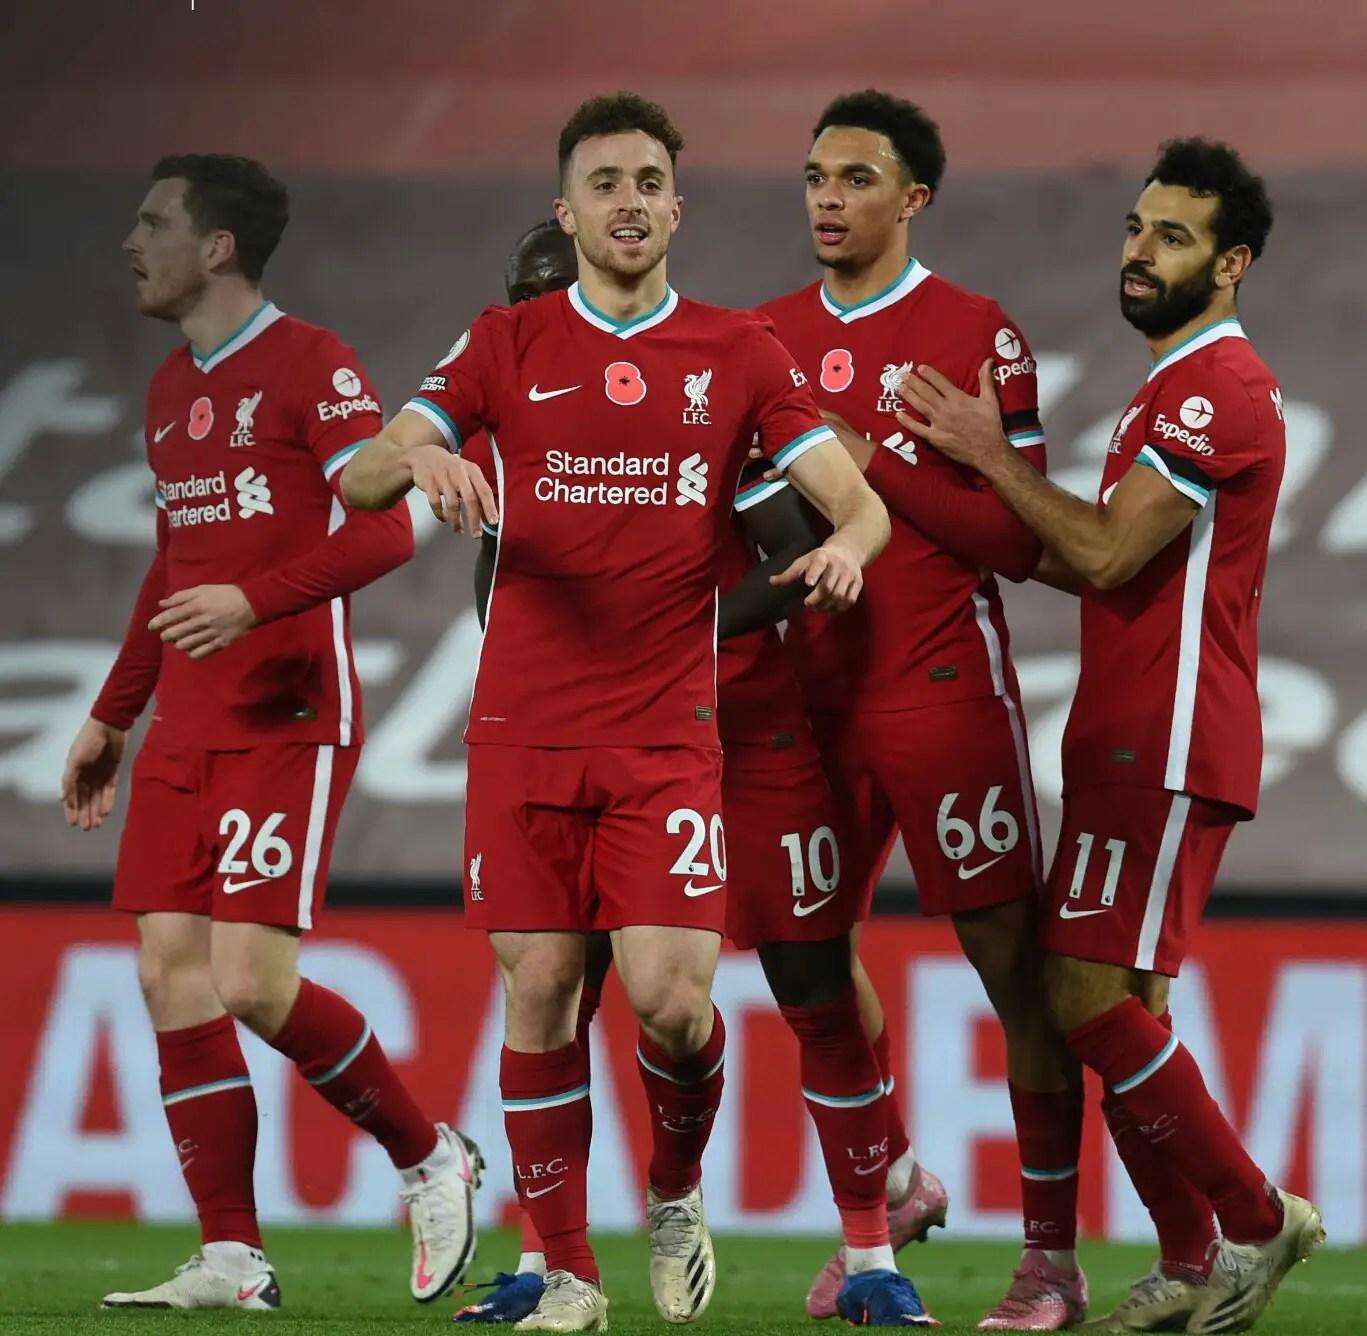 Premier League: Liverpool Overcome West Ham, Extend Unbeaten Home Run